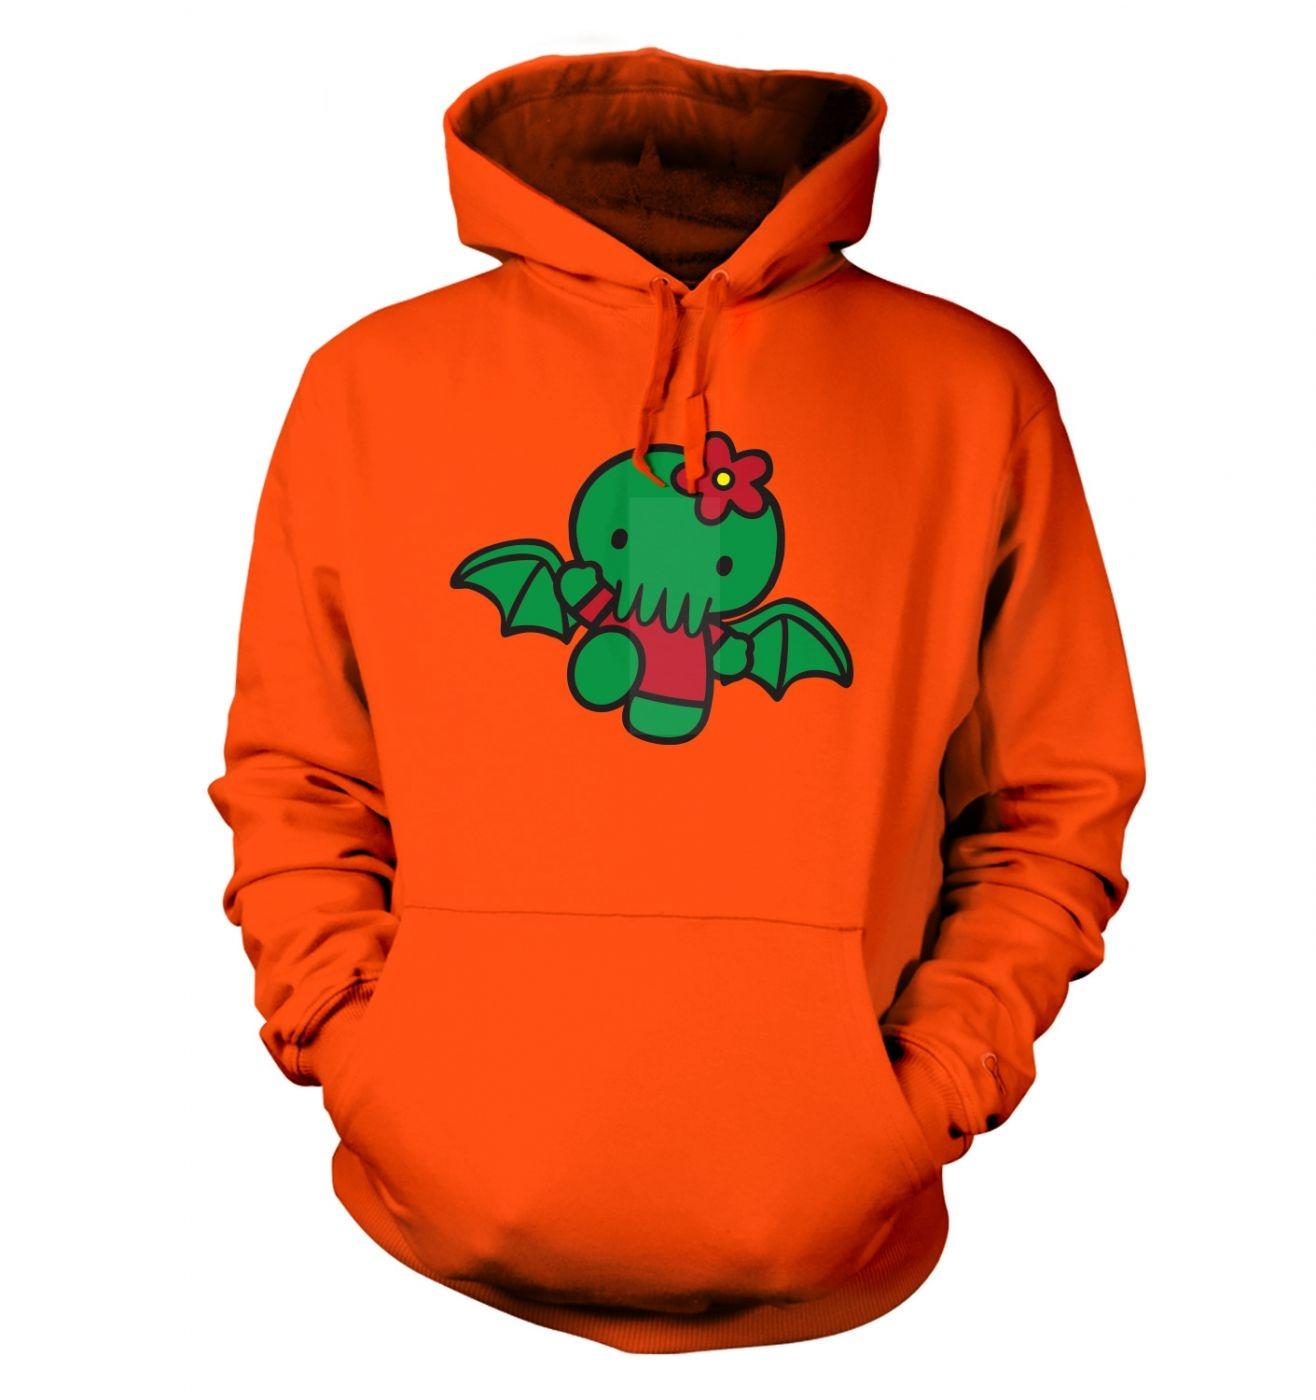 Hello Cthulhu hoodie